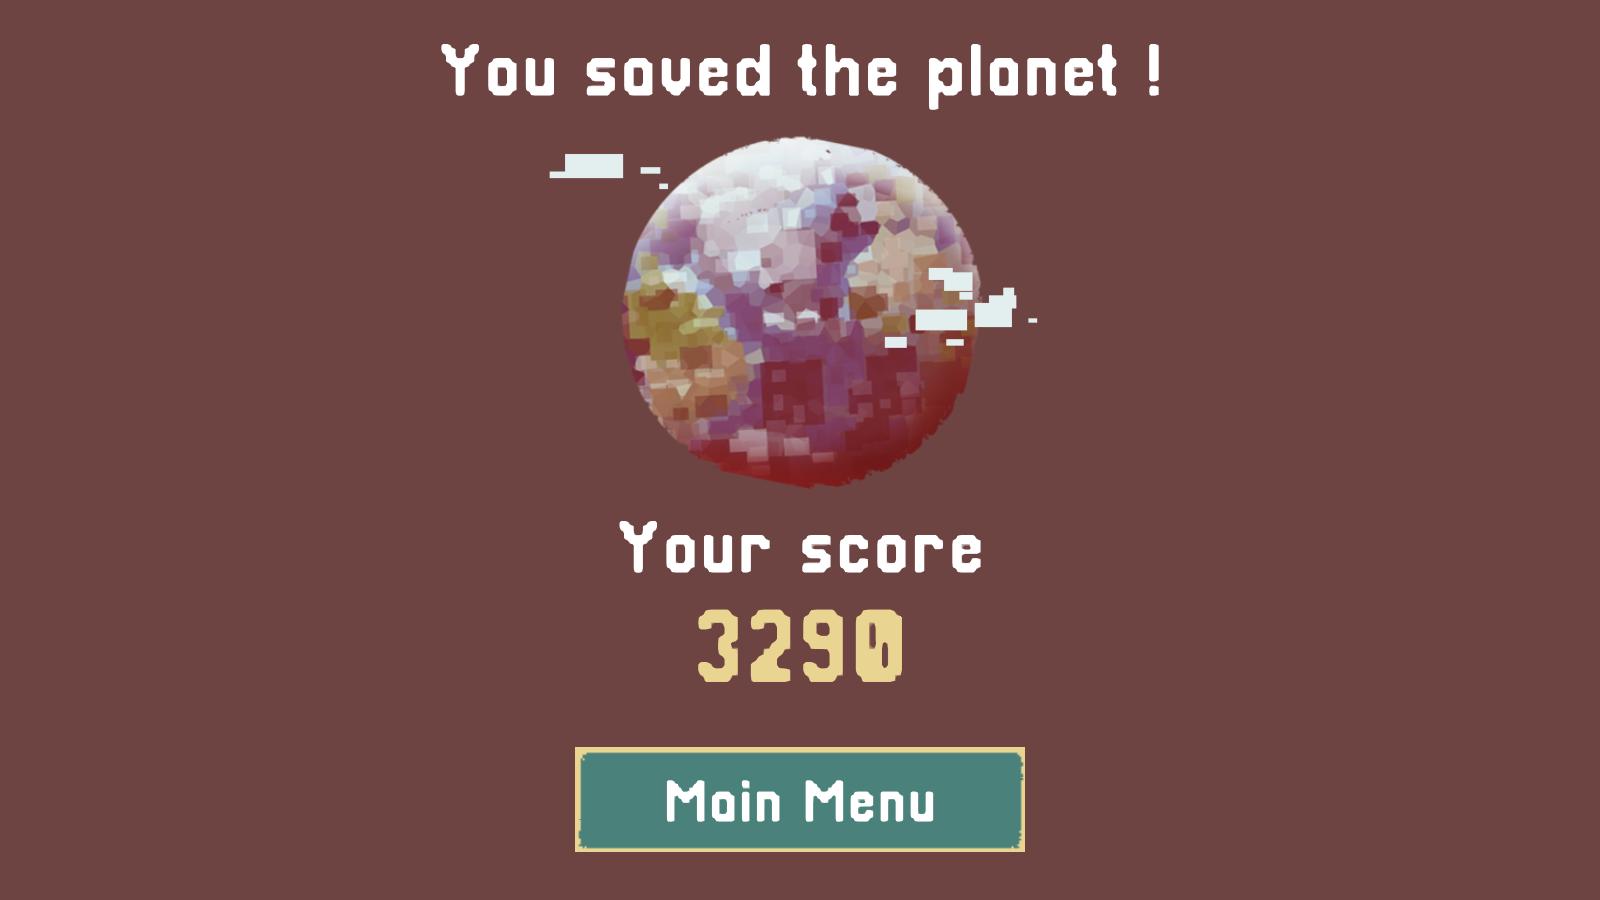 No humans - Score